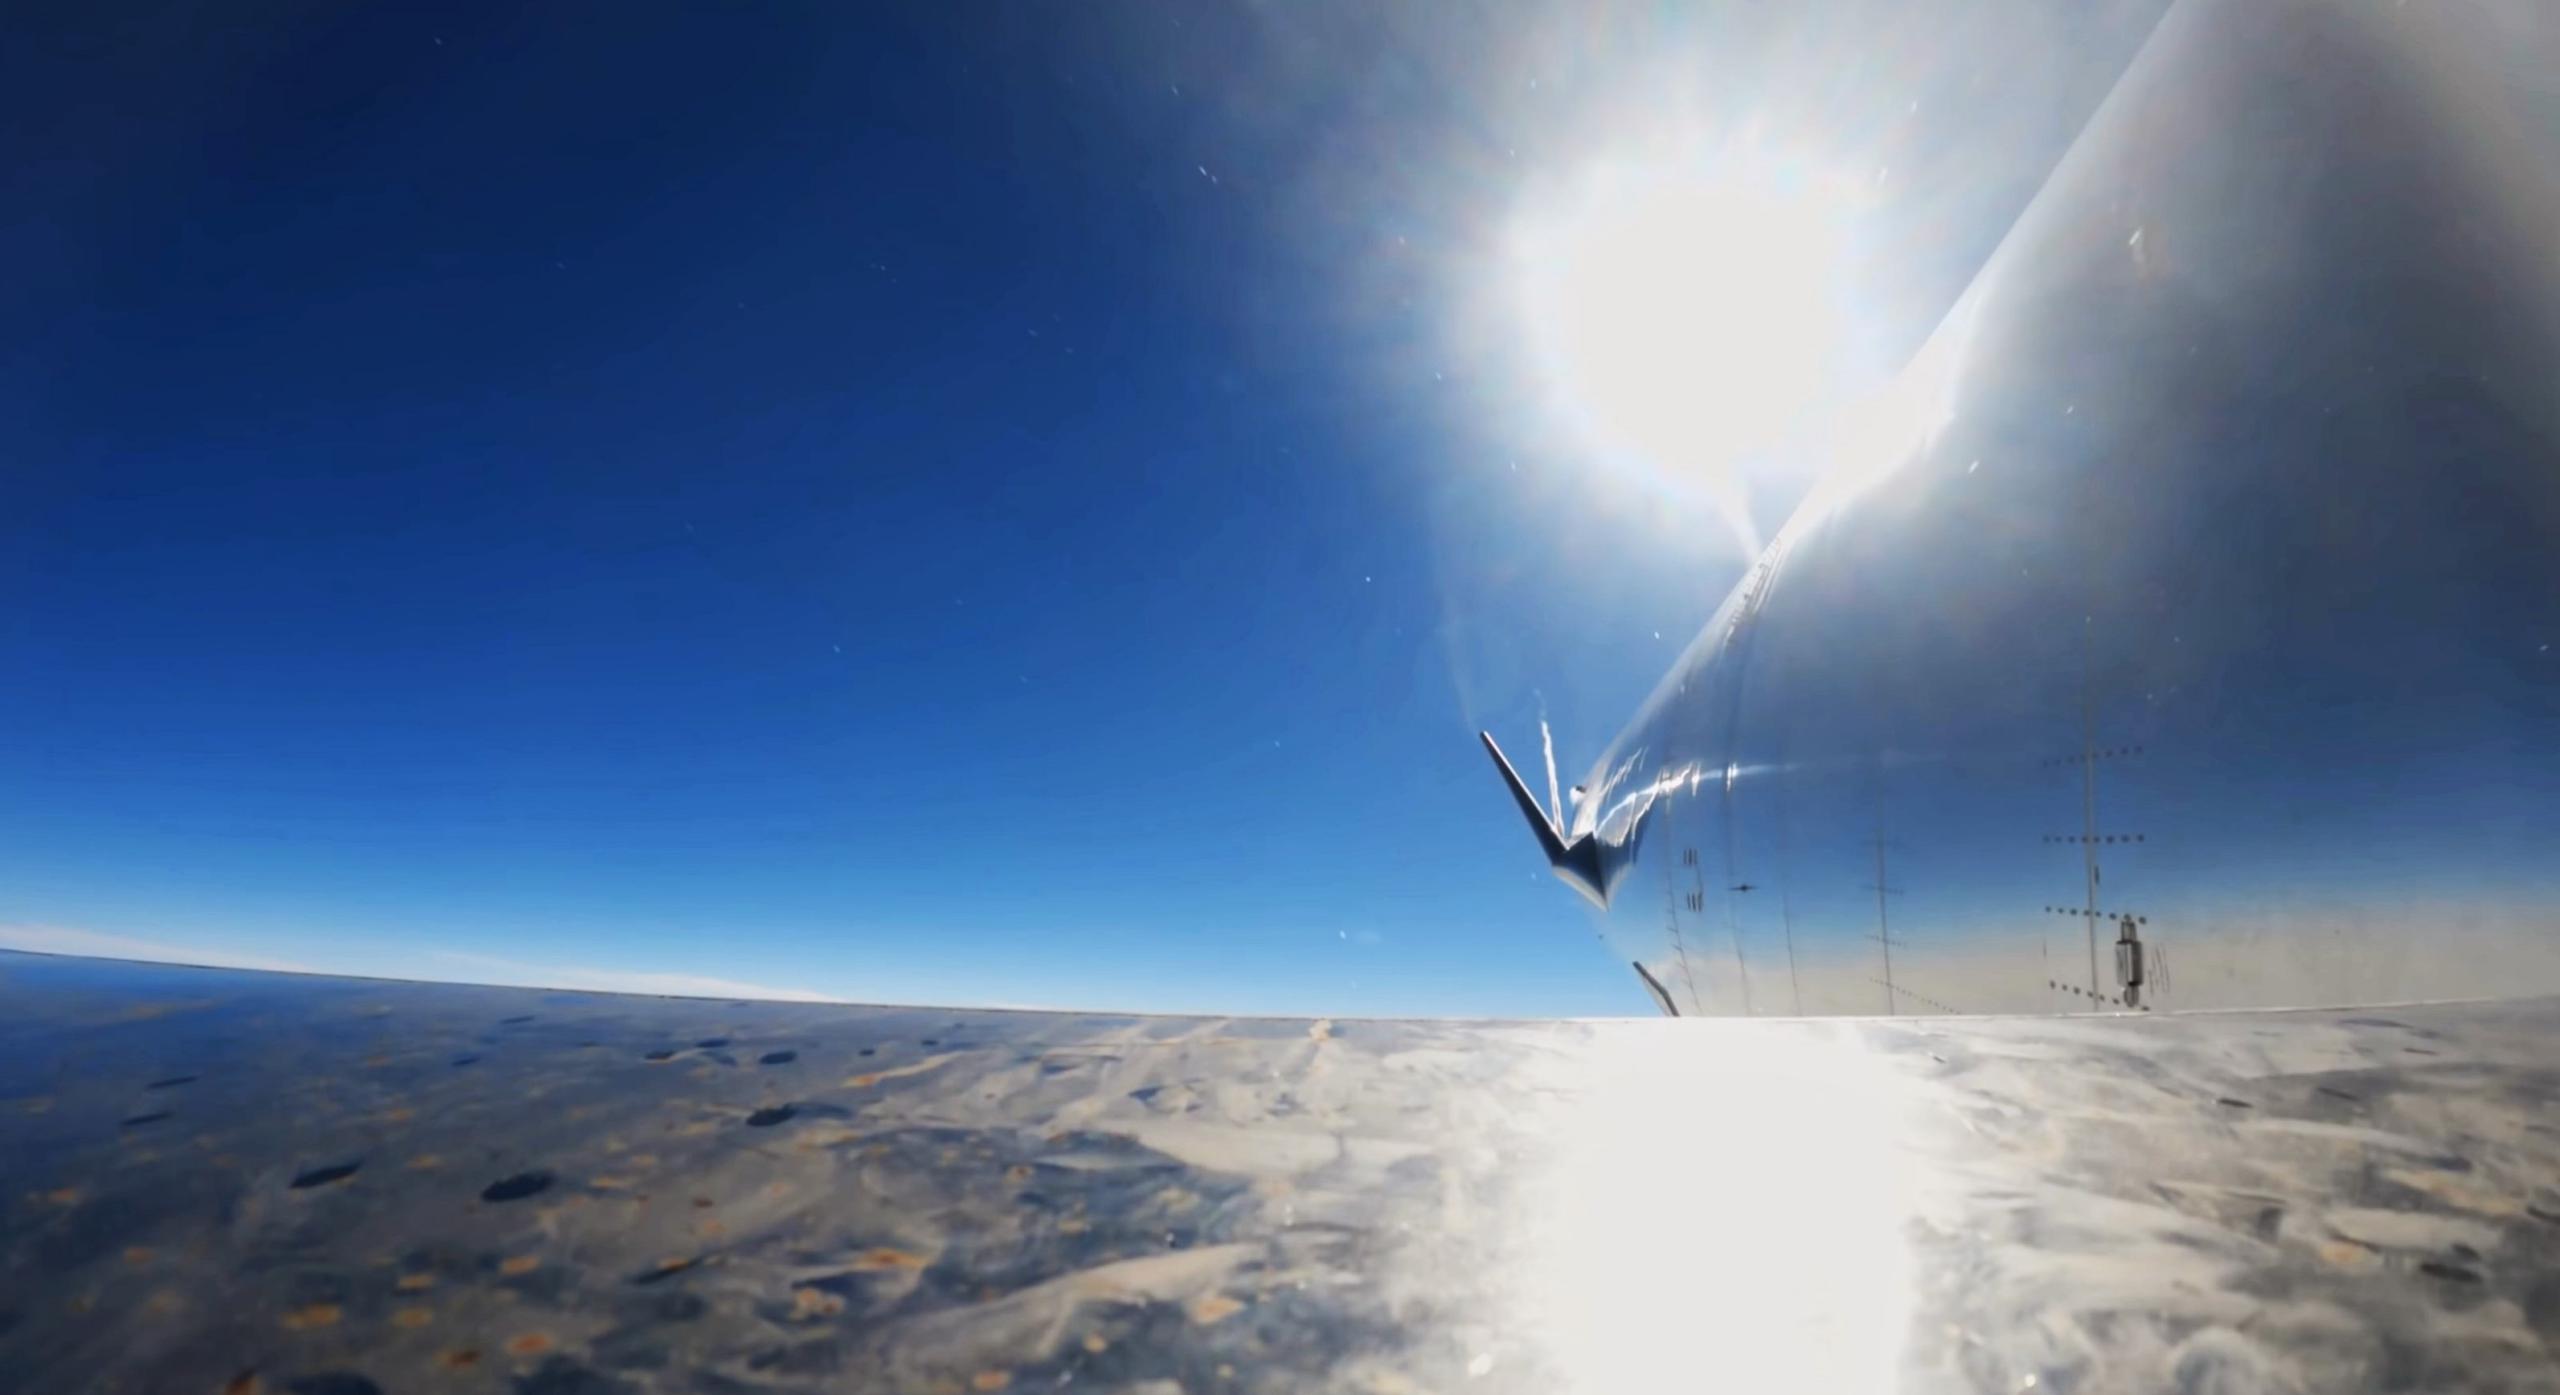 Starship SN15 10km flight test 050521 recap (SpaceX) flap view 5 (c)